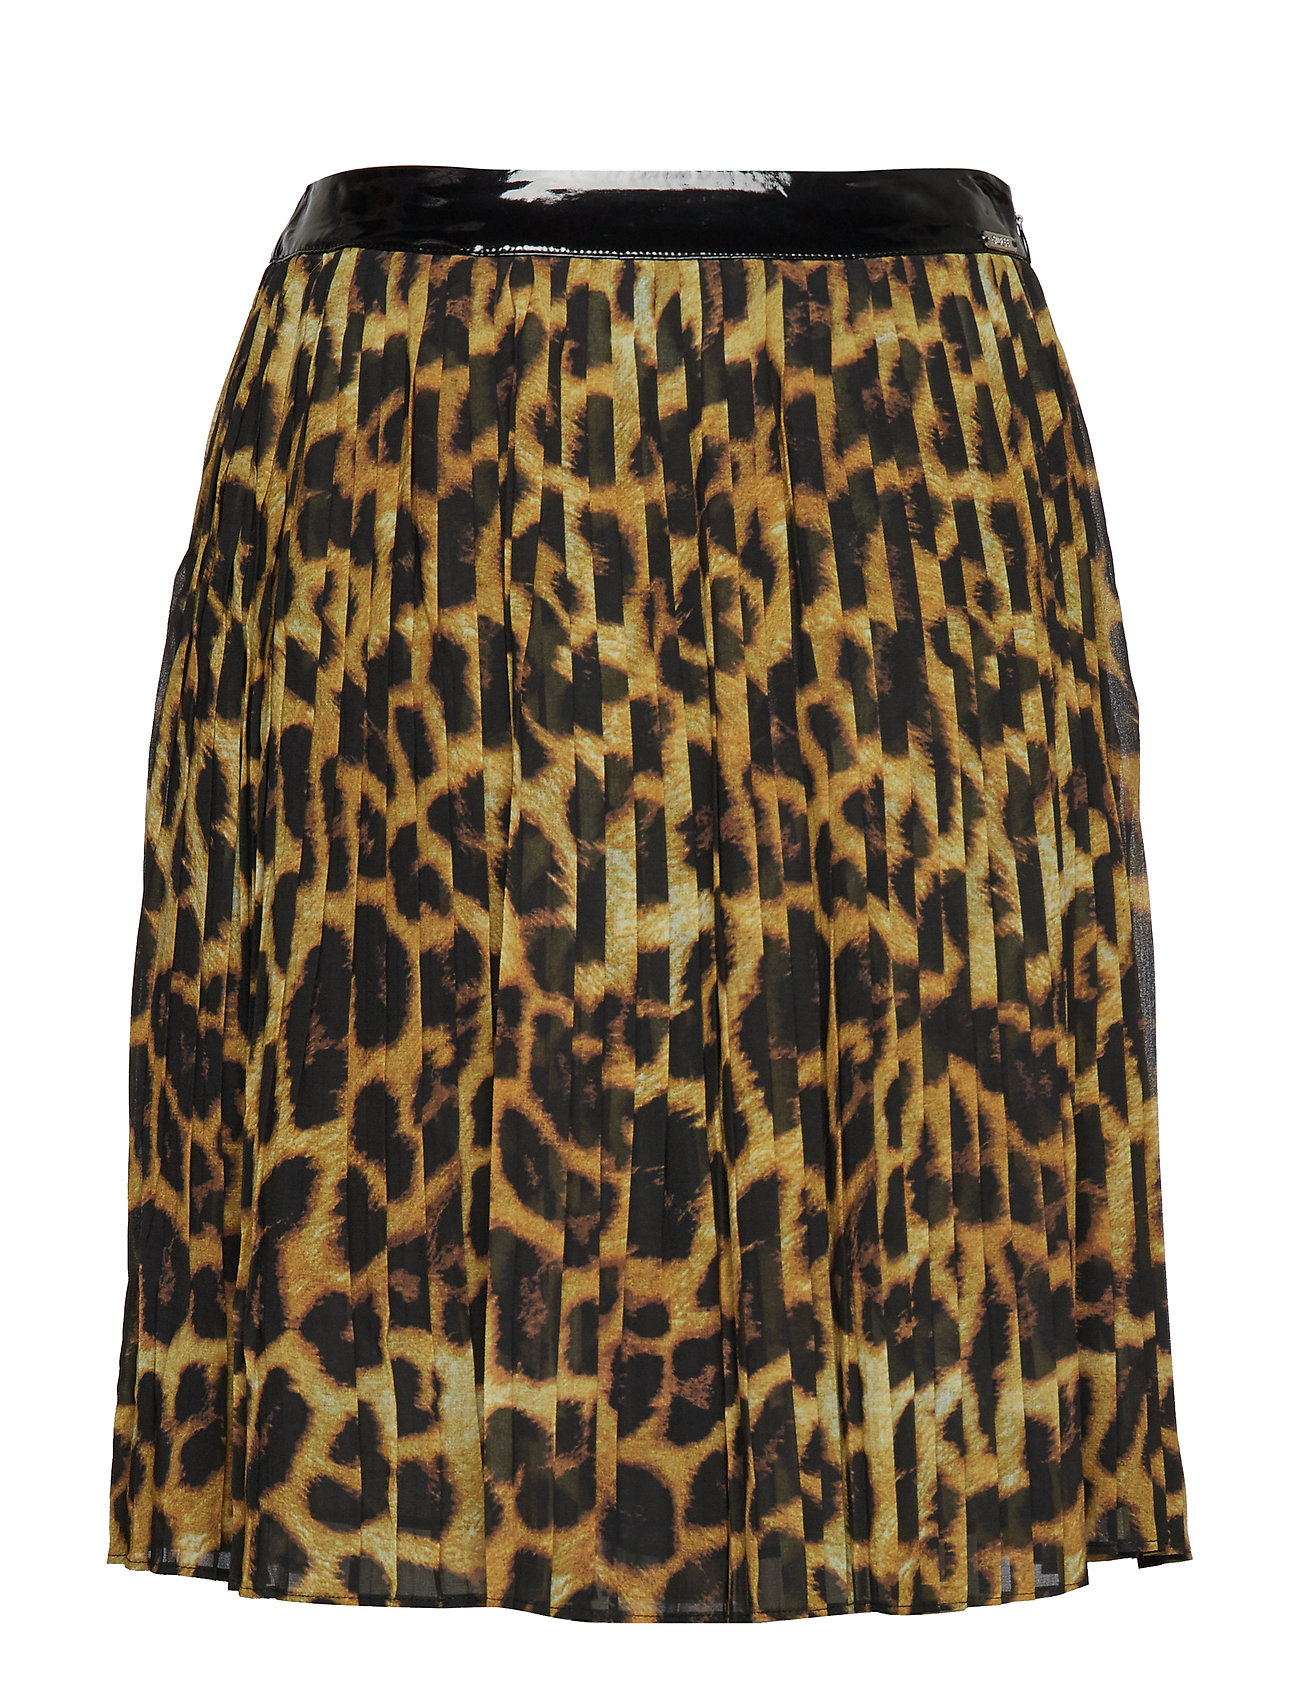 BeigGuess Tiana BeigGuess Jeans Skirtreal Skirtreal Leopard Leopard Tiana vnw0OmN8